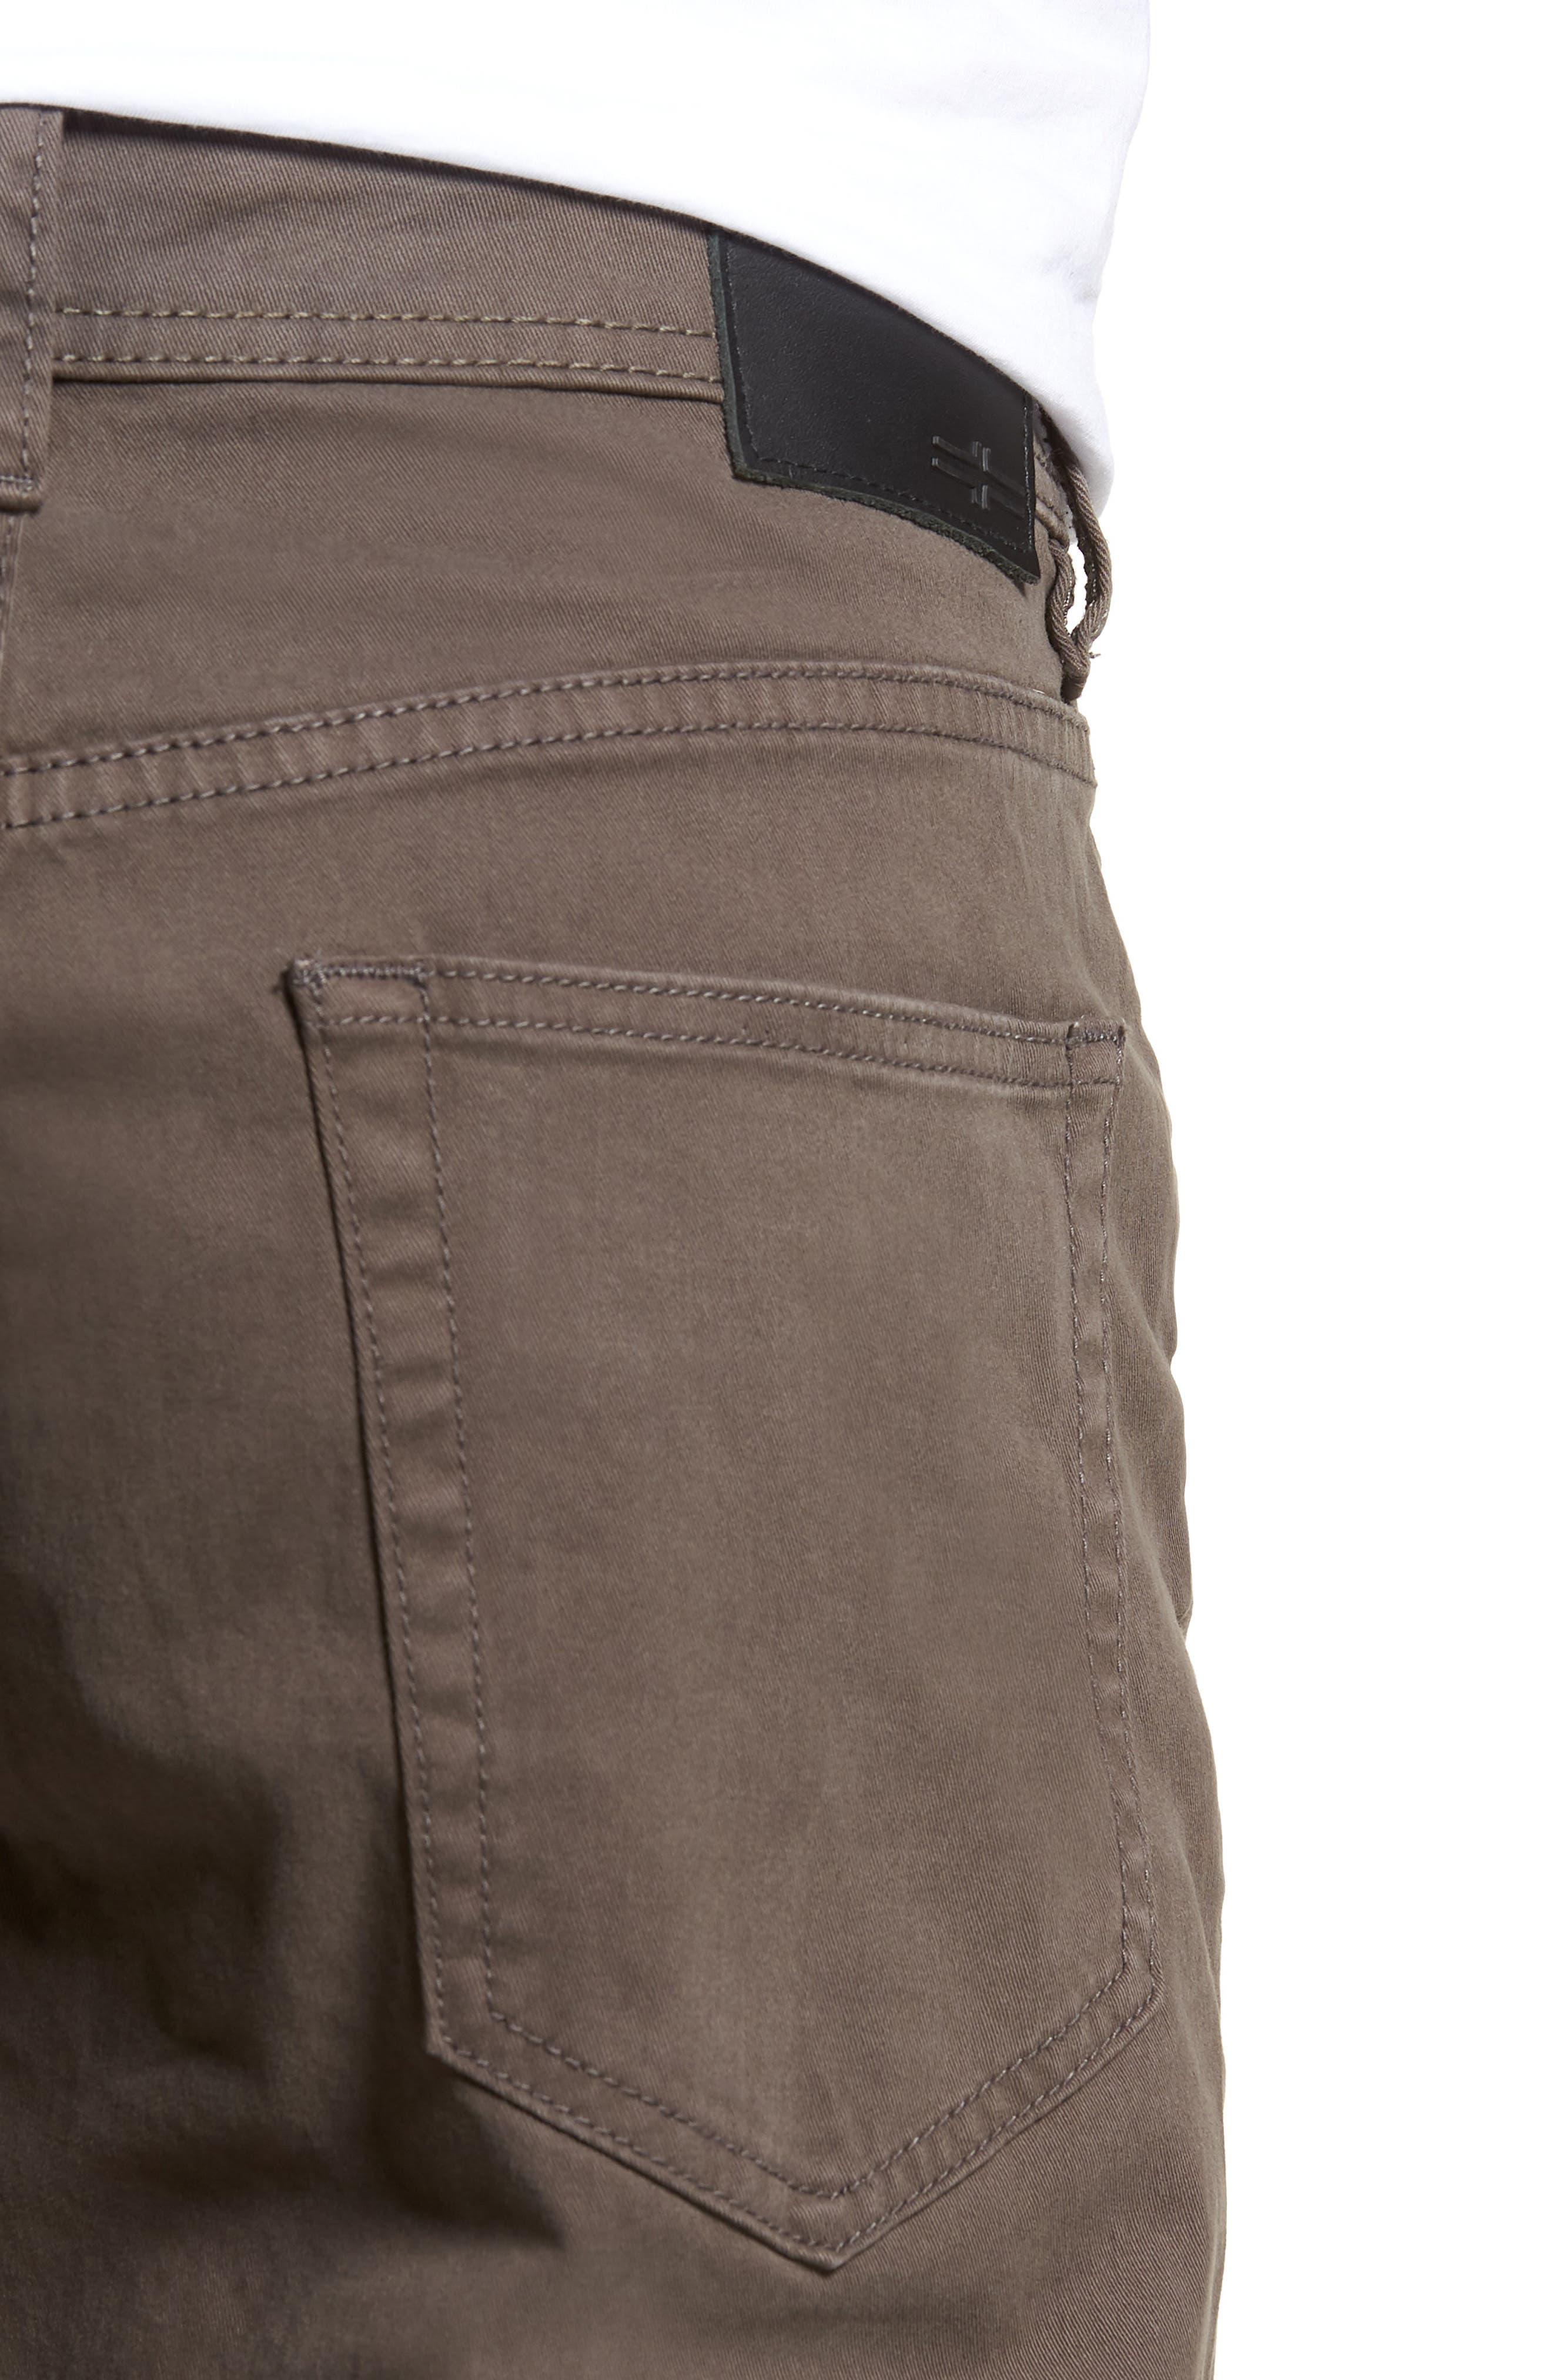 Jeans Co. Kingston Slim Straight Leg Jeans,                             Alternate thumbnail 4, color,                             Deep Earth